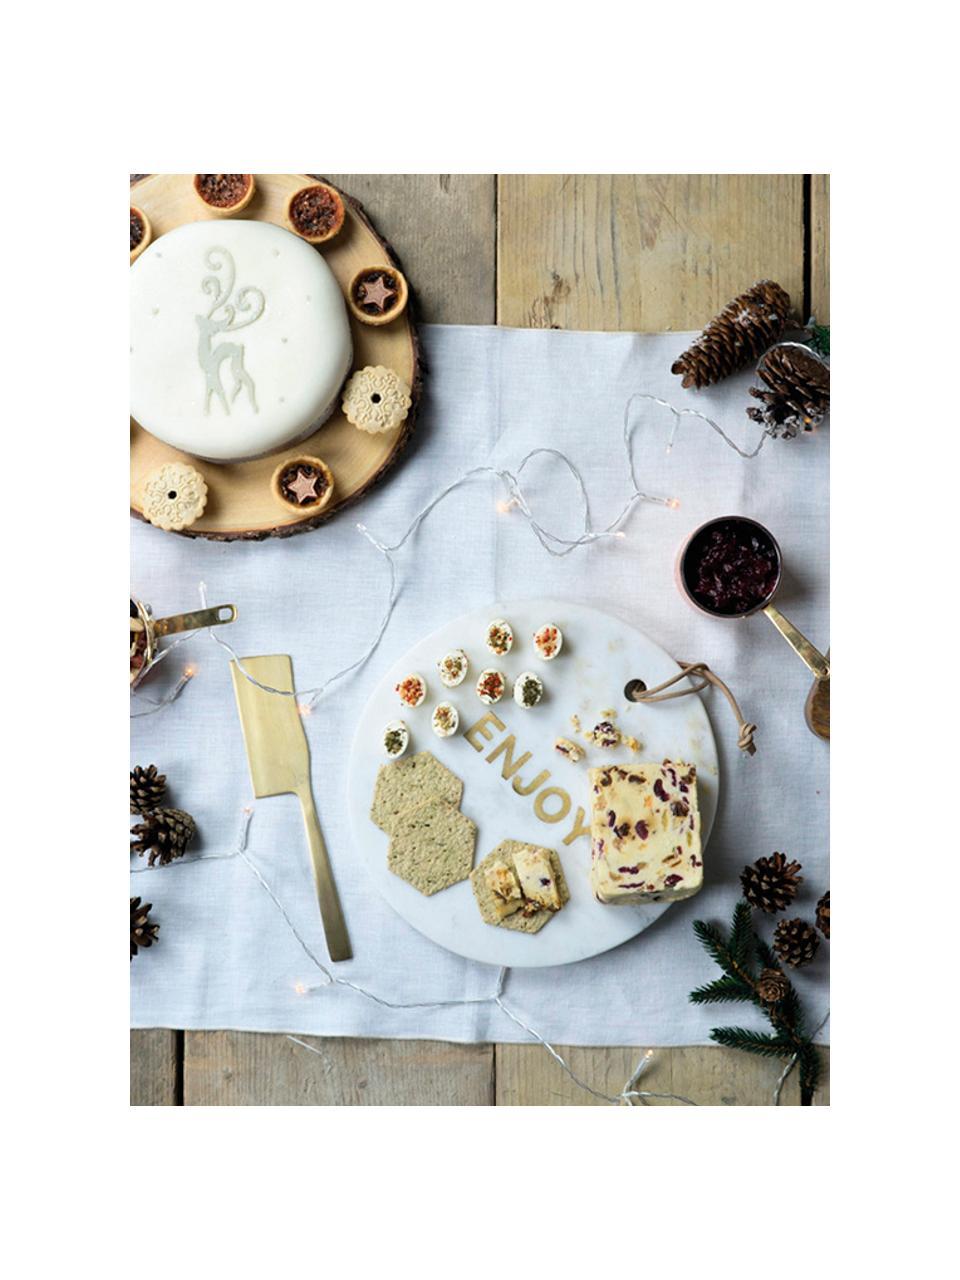 Marmeren serveerplank Artesa, Ø 26 cm, Marmer, Wit, goudkleurig, Ø 26 cm